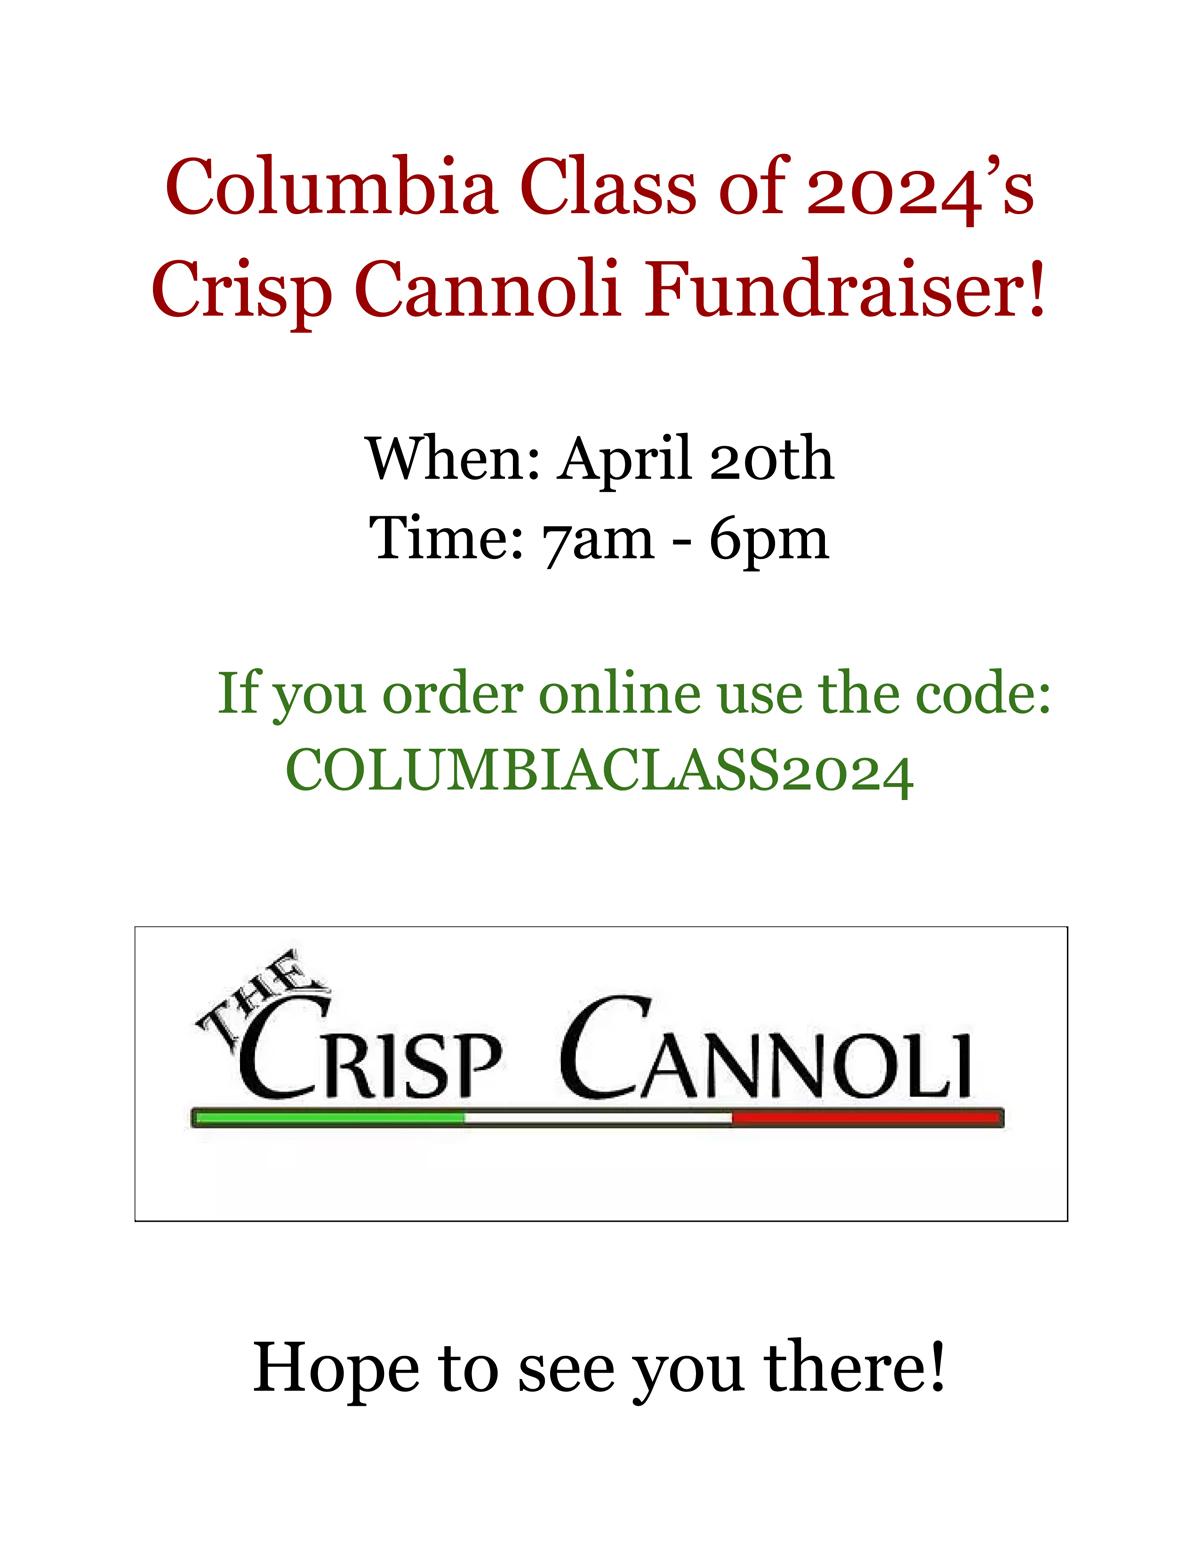 Crisp Cannoli Fundraiser flyer